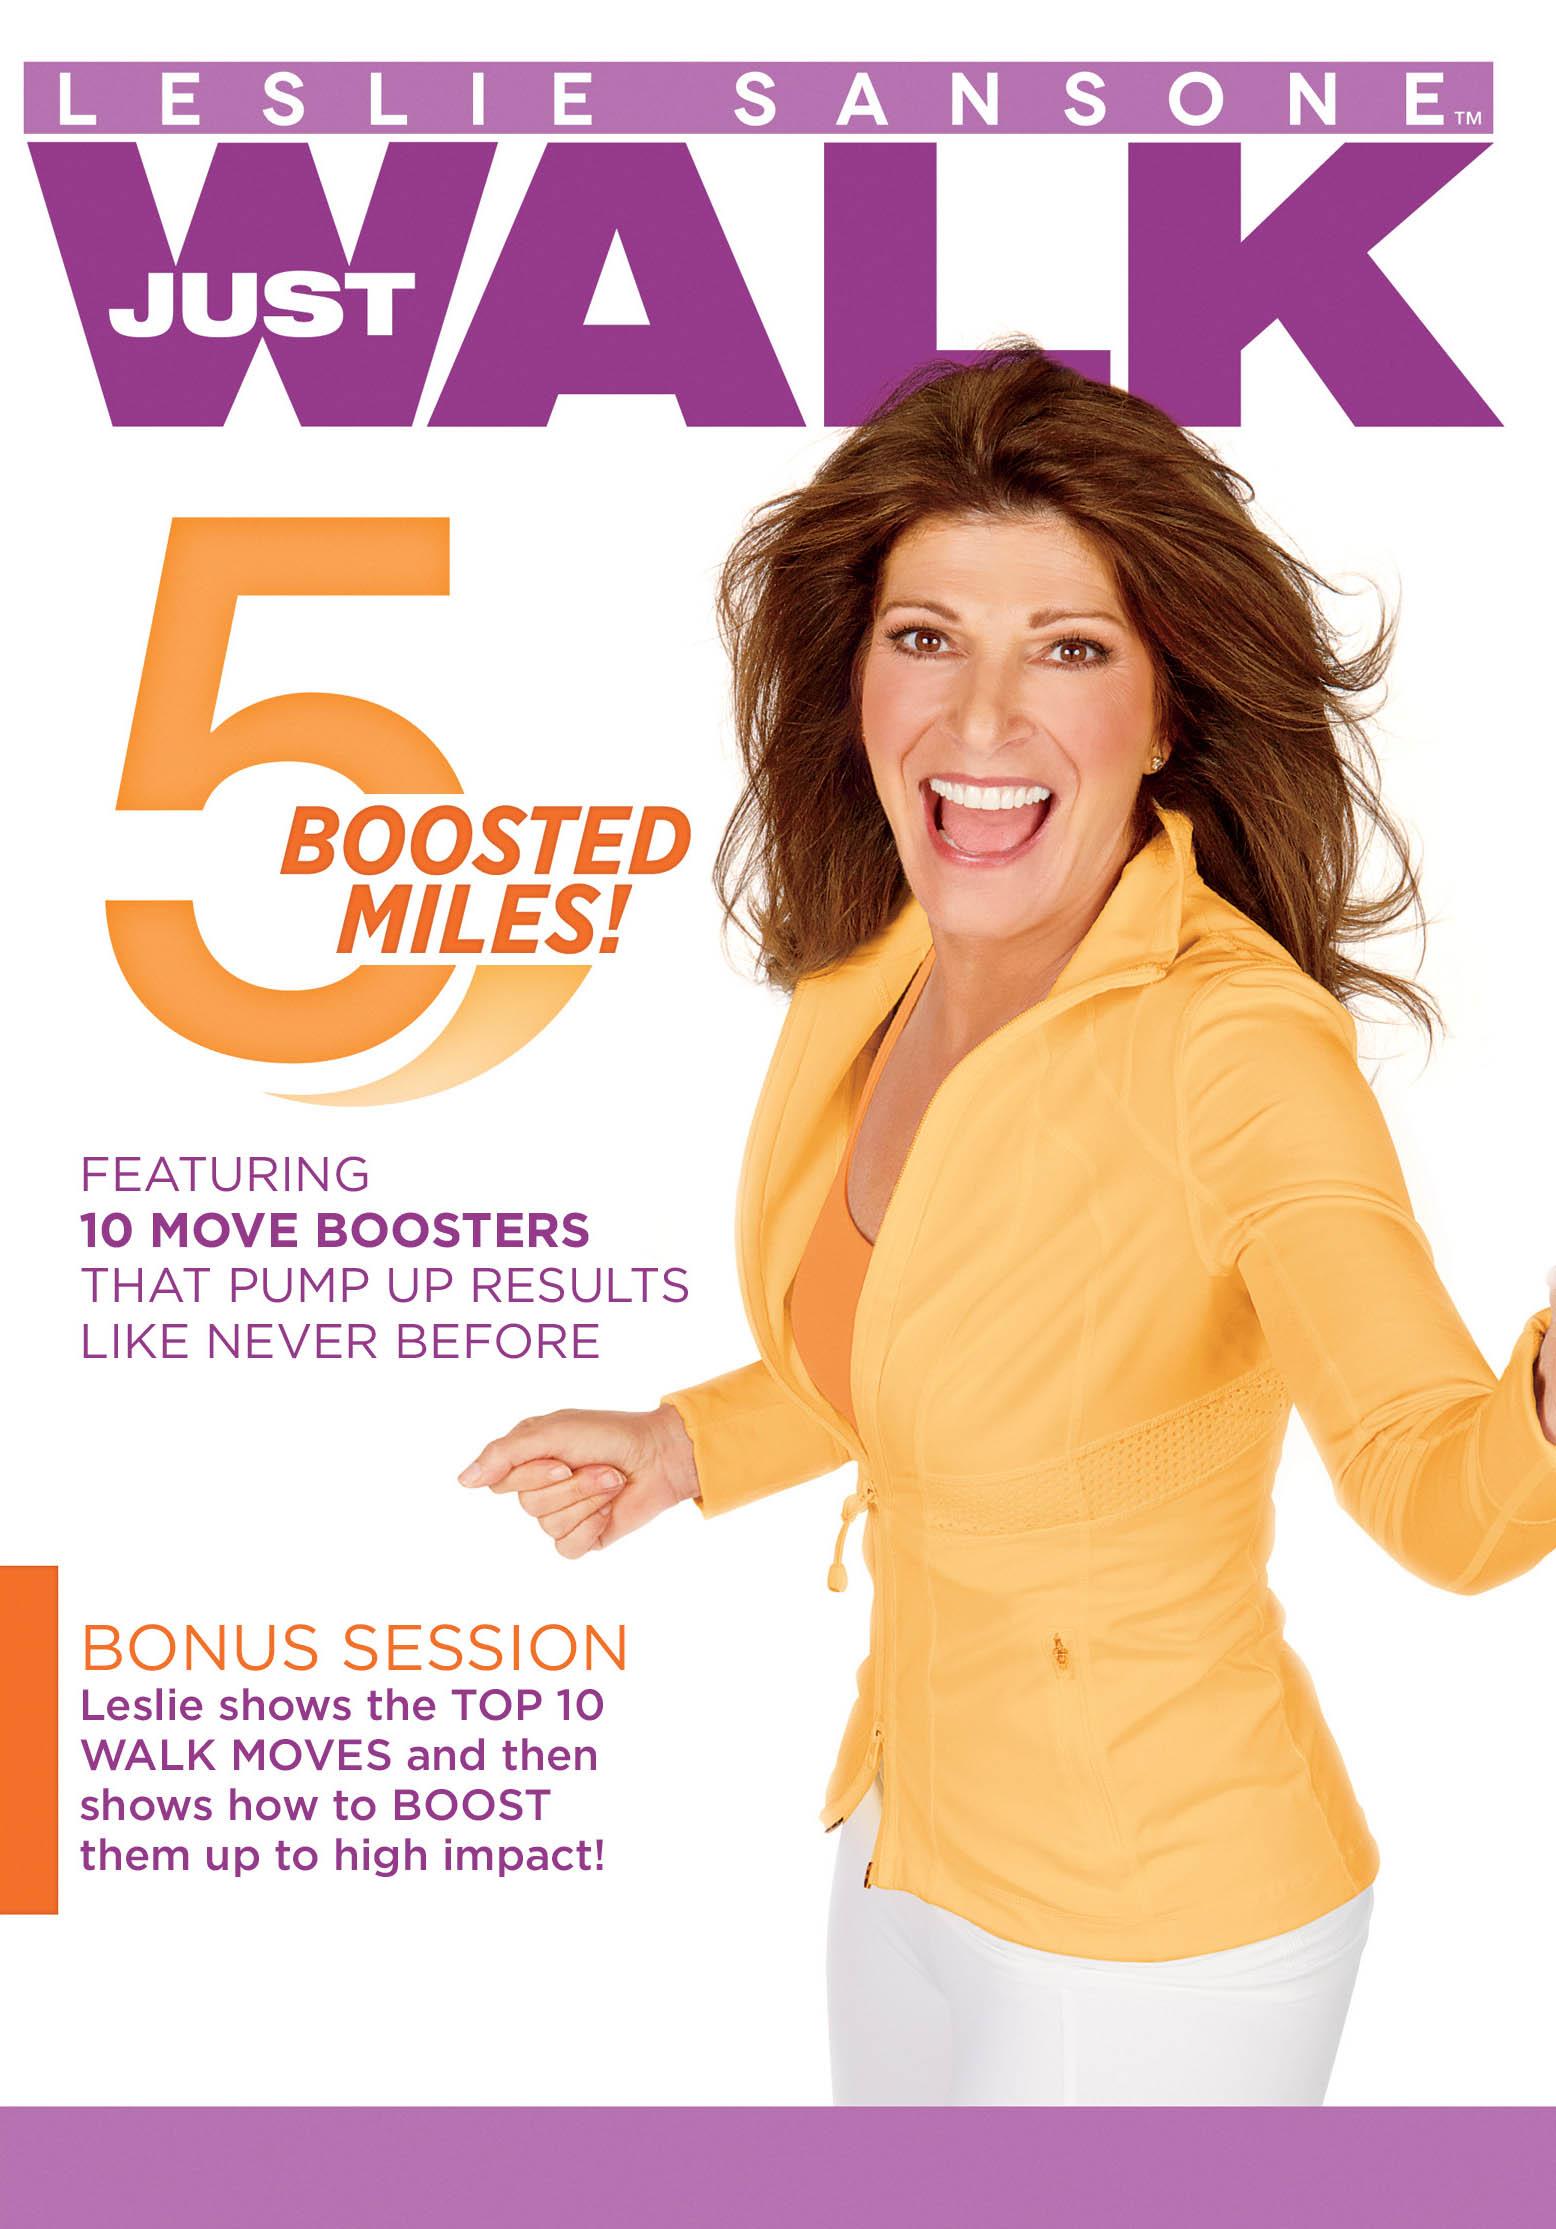 Leslie Sansone: Just Walk - 5 Boosted Miles!